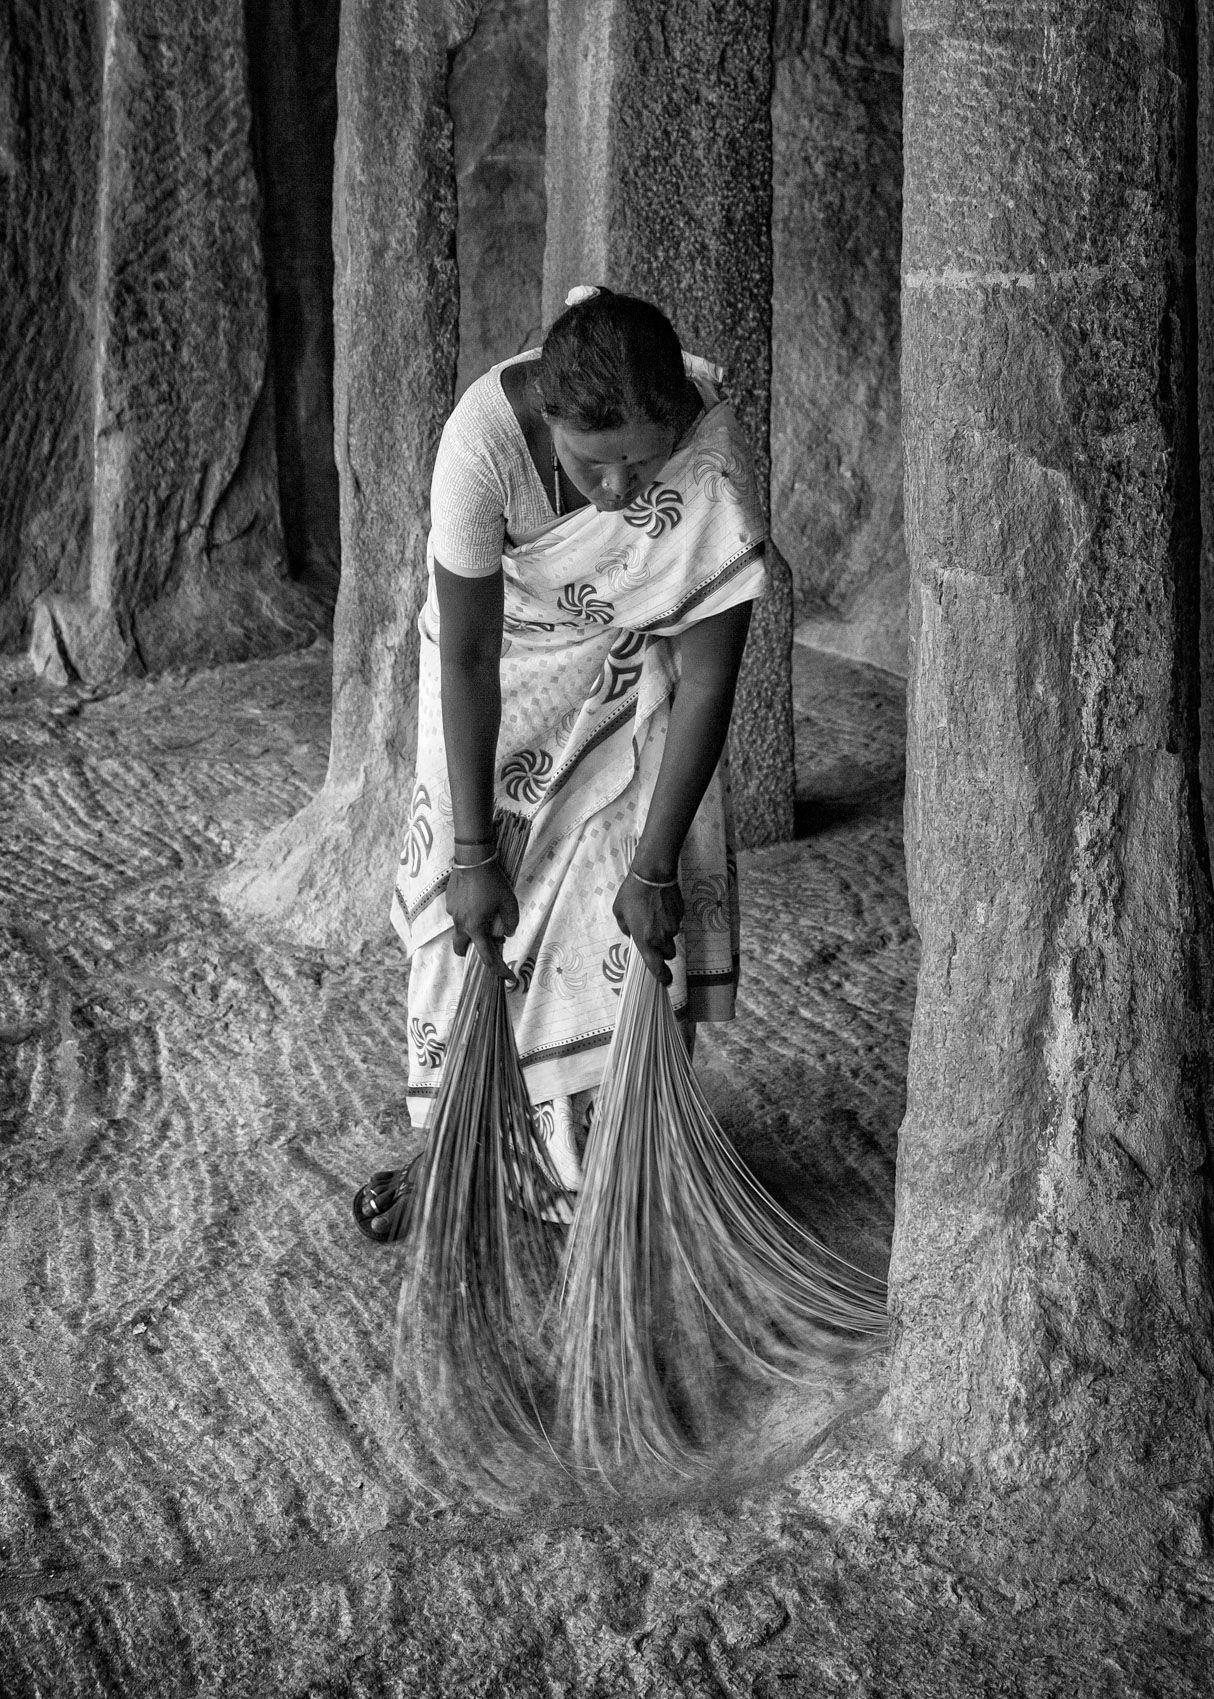 work.laborers-5.jpg